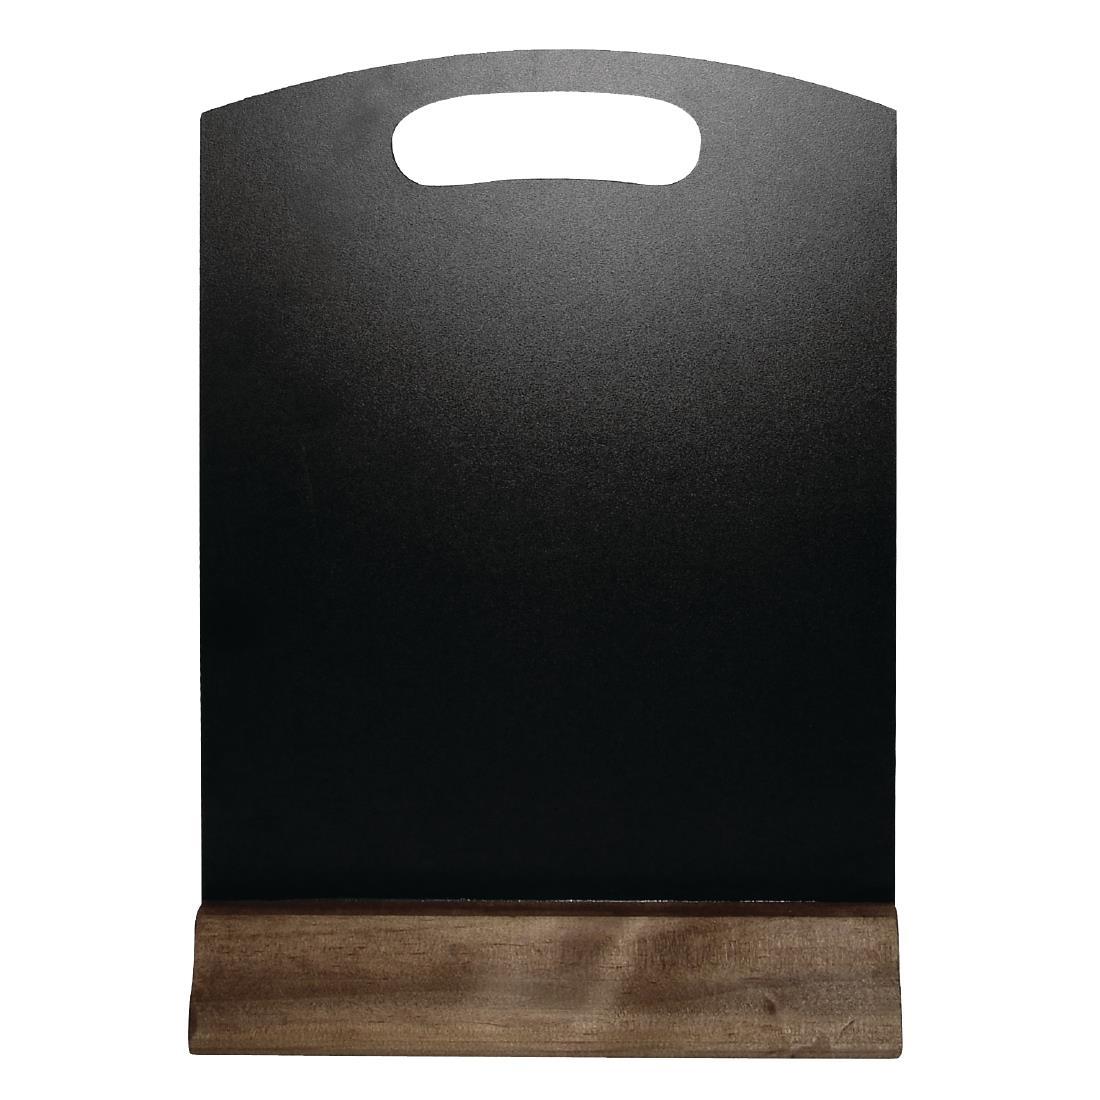 Olympia Freestanding Table Top Blackboard